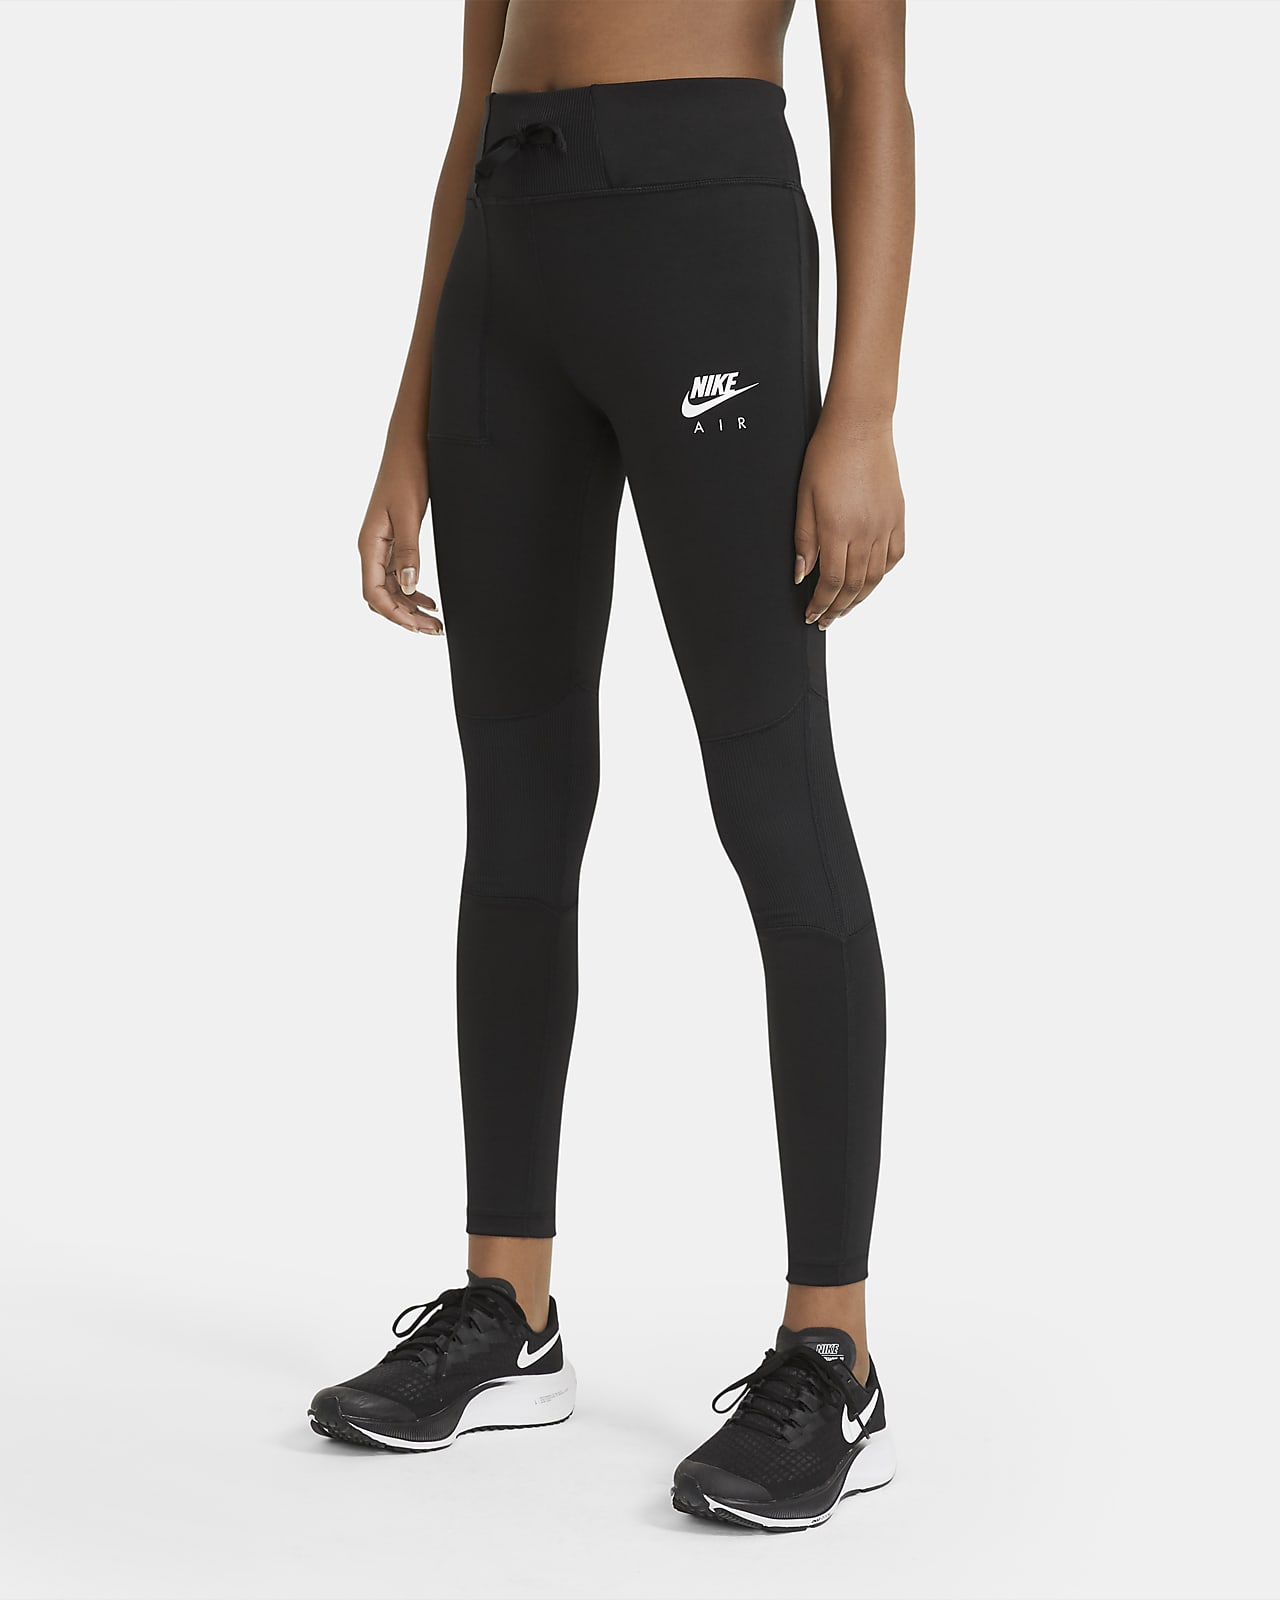 Nike Air Trainings-Leggings für ältere Kinder (Mädchen)